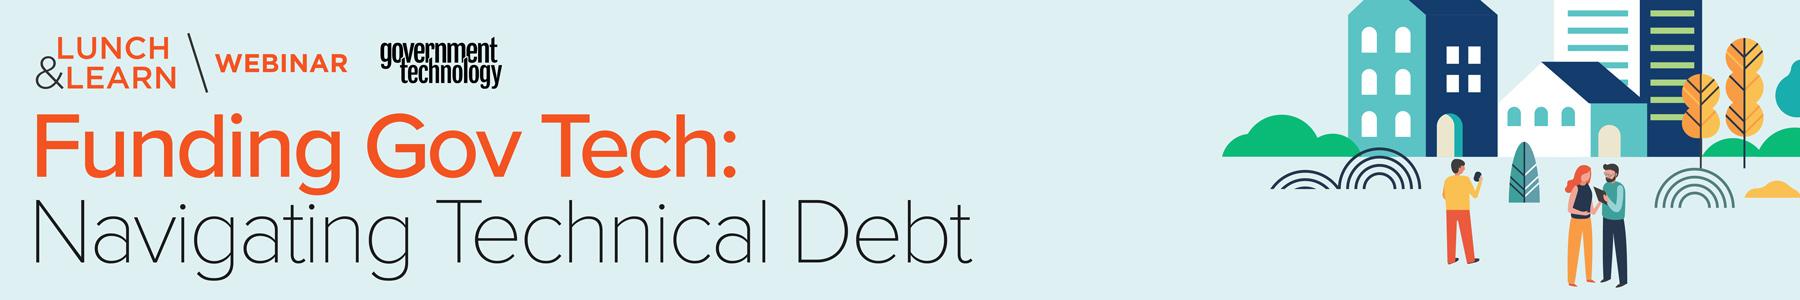 Navigating Technical Debt